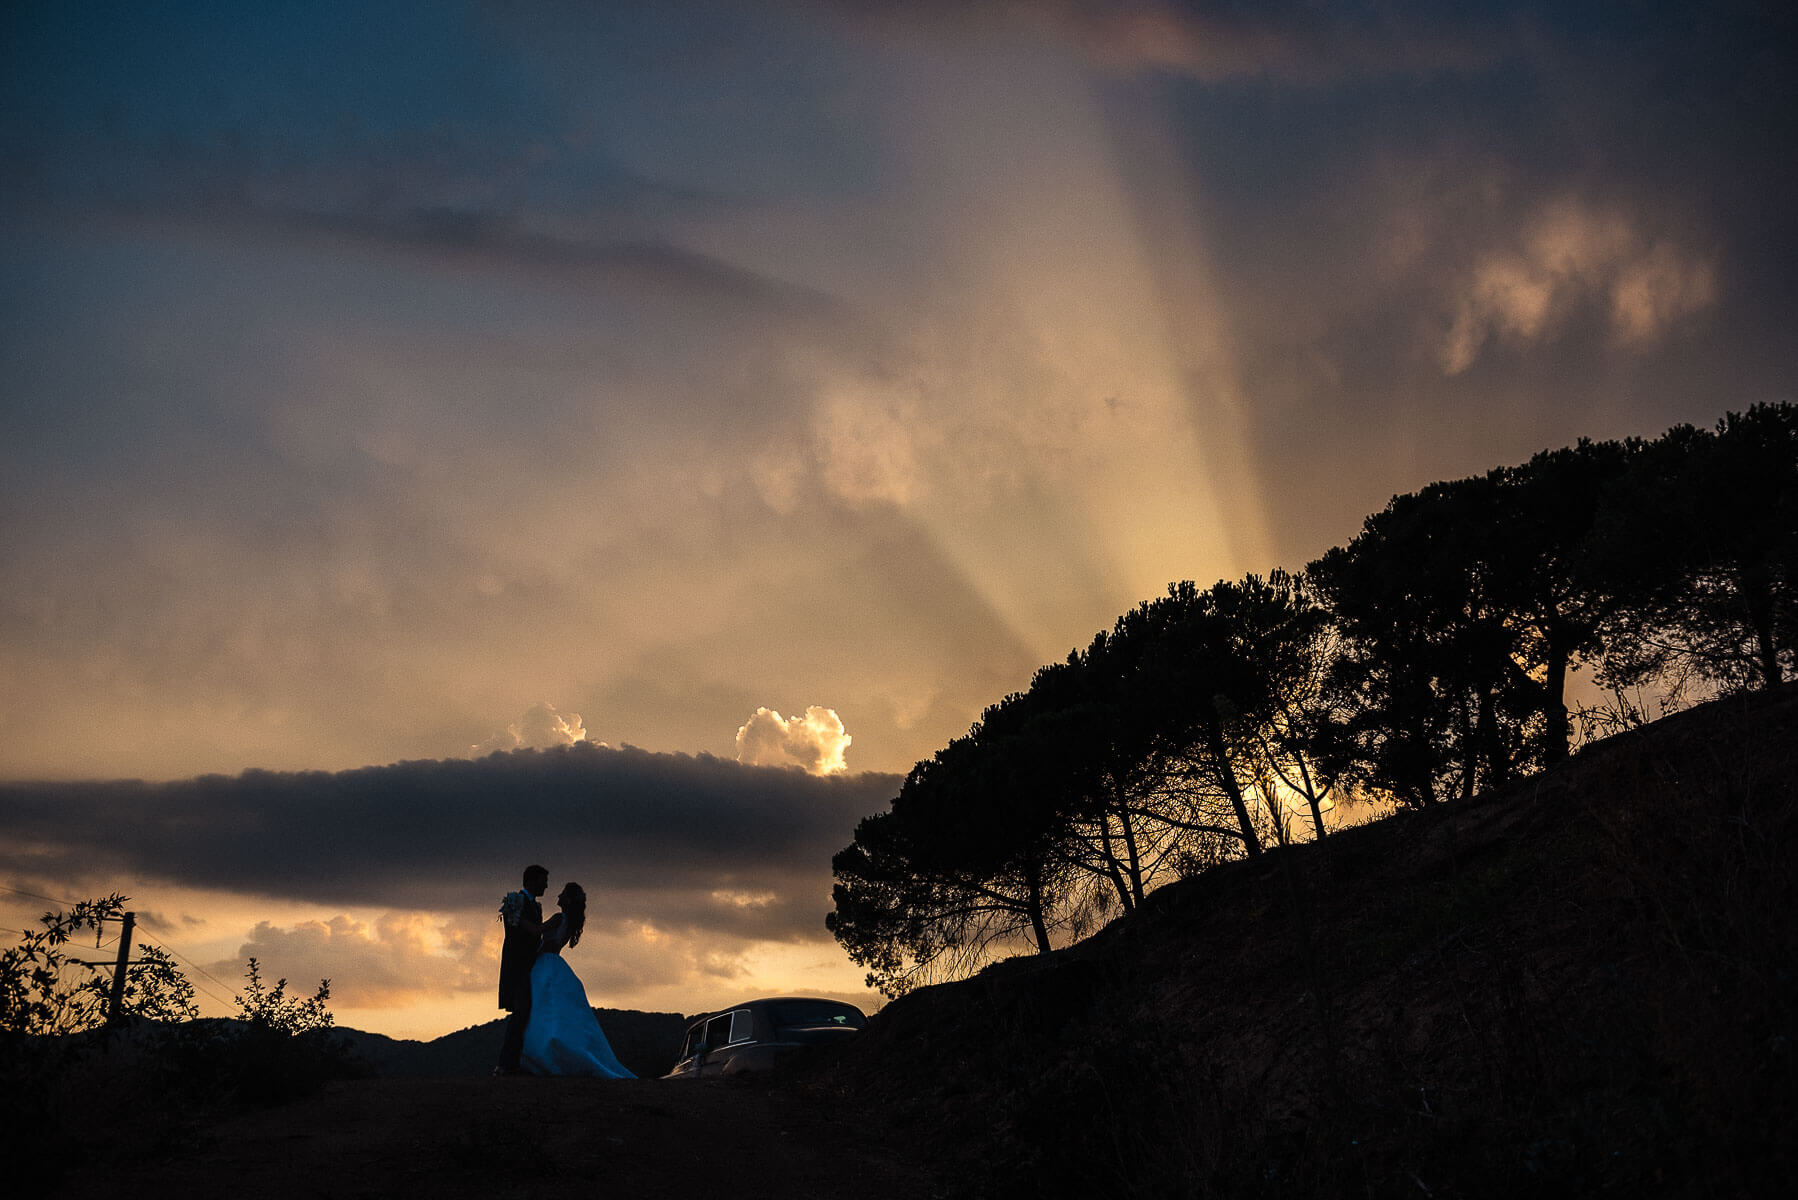 Boda Cris & Juanca foto novios paisaje | Manel Tamayo, Wedding photographer